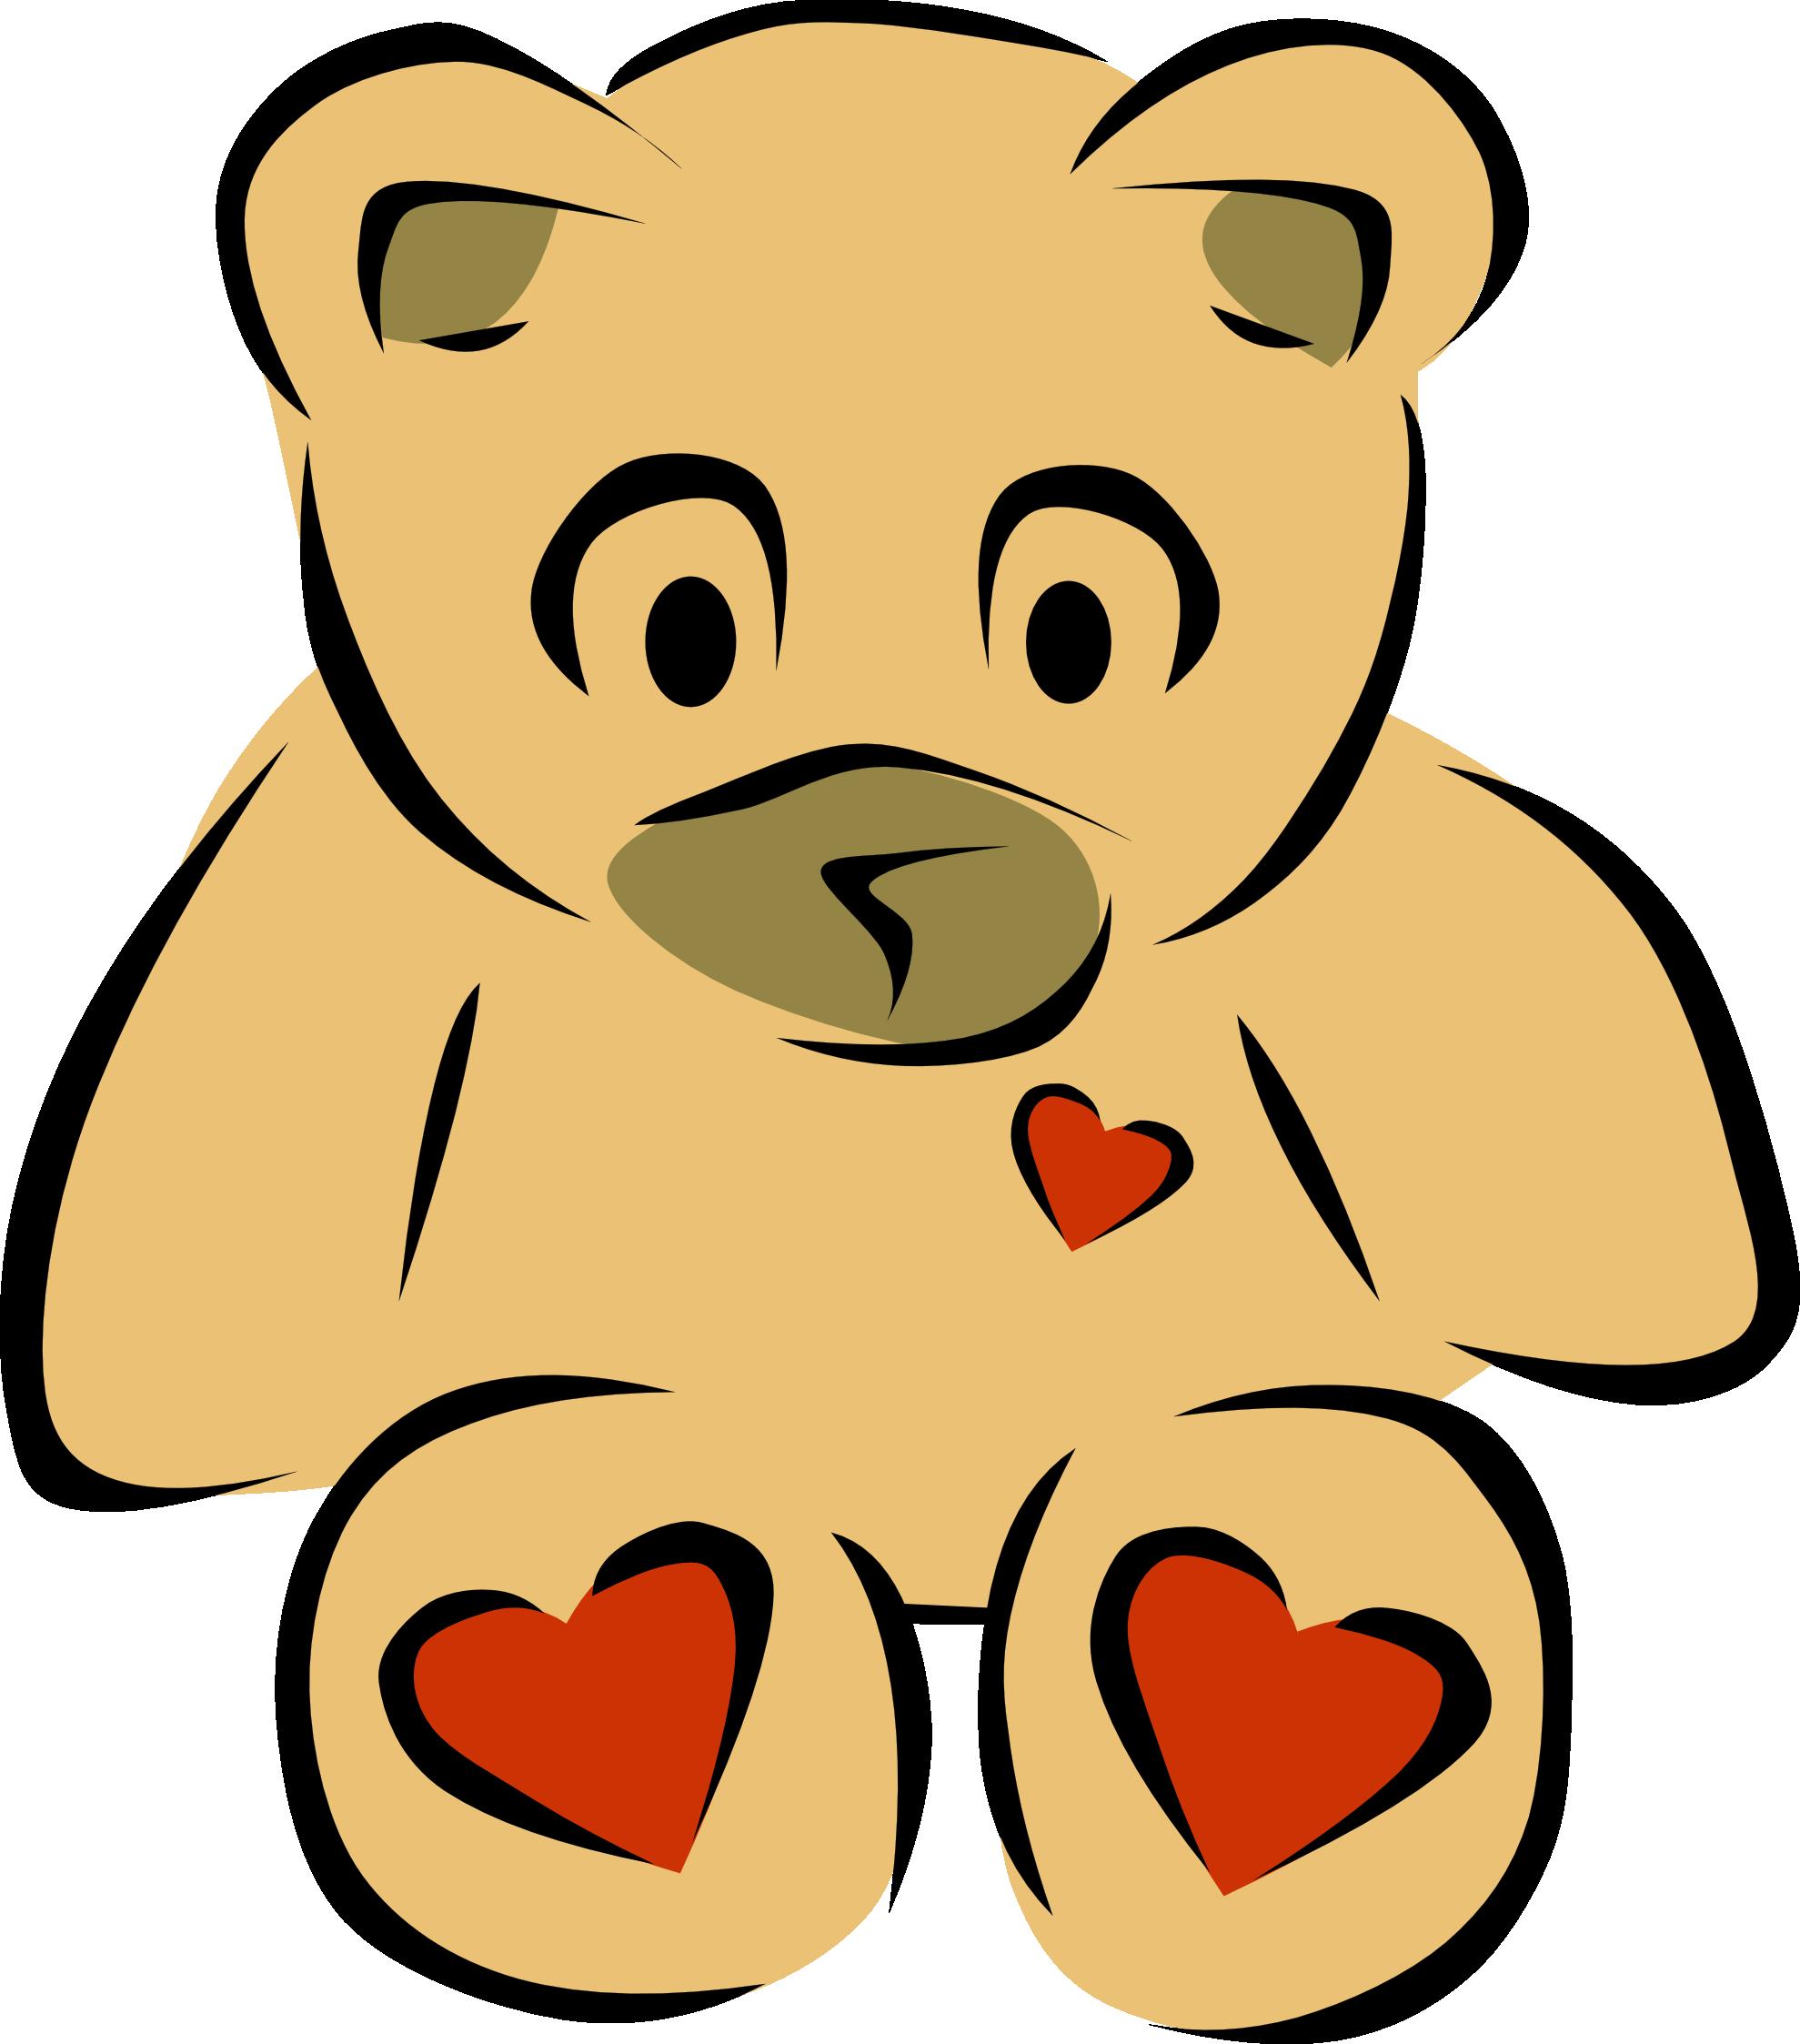 Heart clipart christmas. Pink teddy bear panda